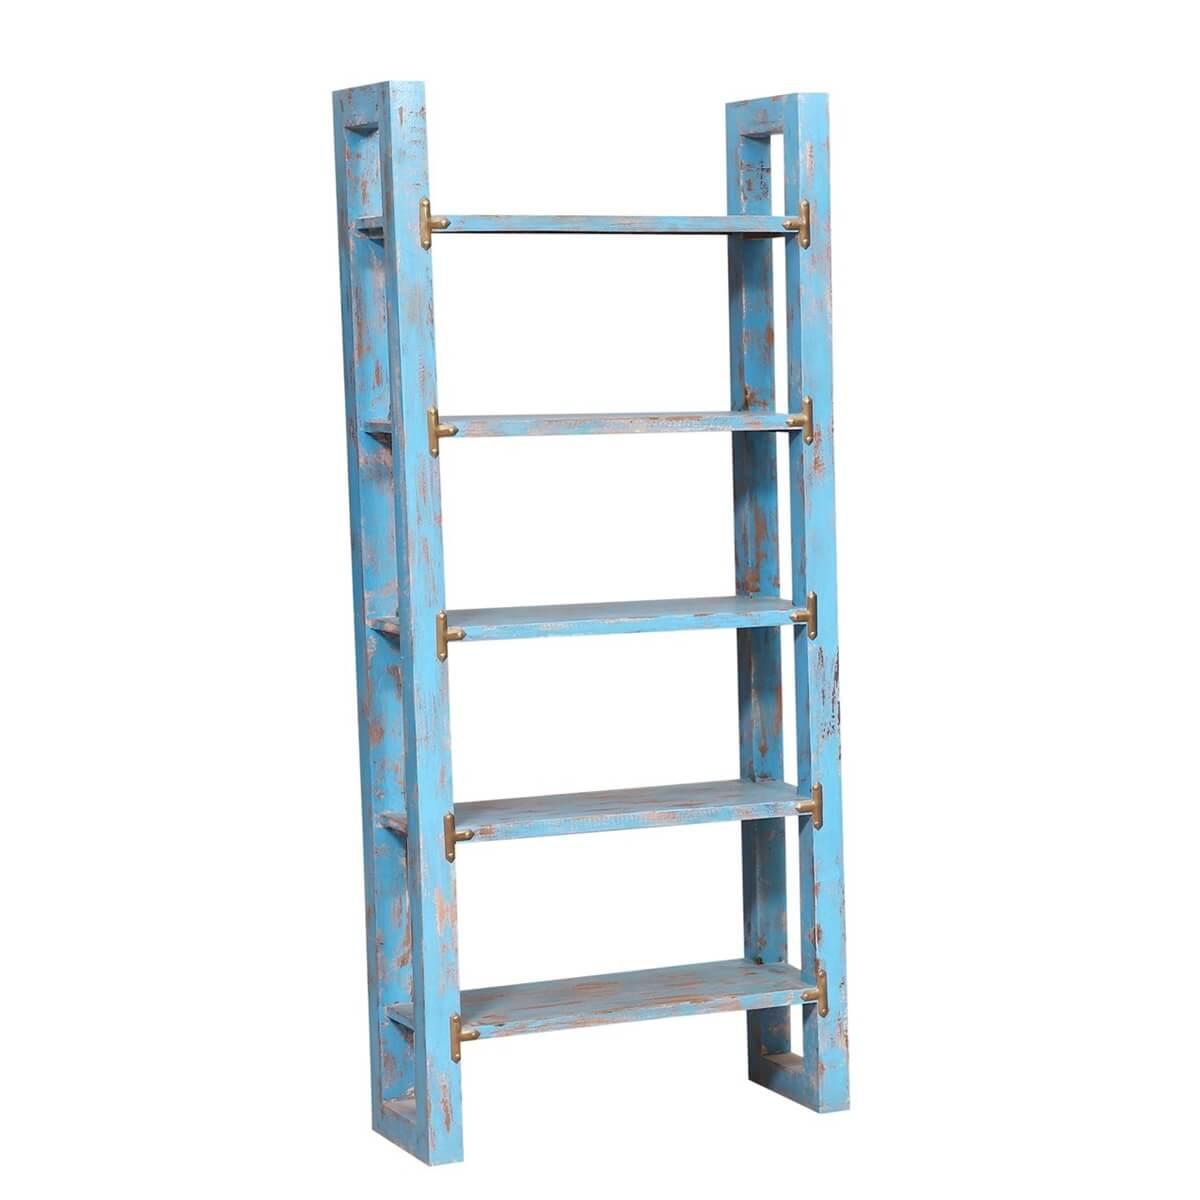 Oretta 5 Shelf Leaning Ladder Rustic Bookcase